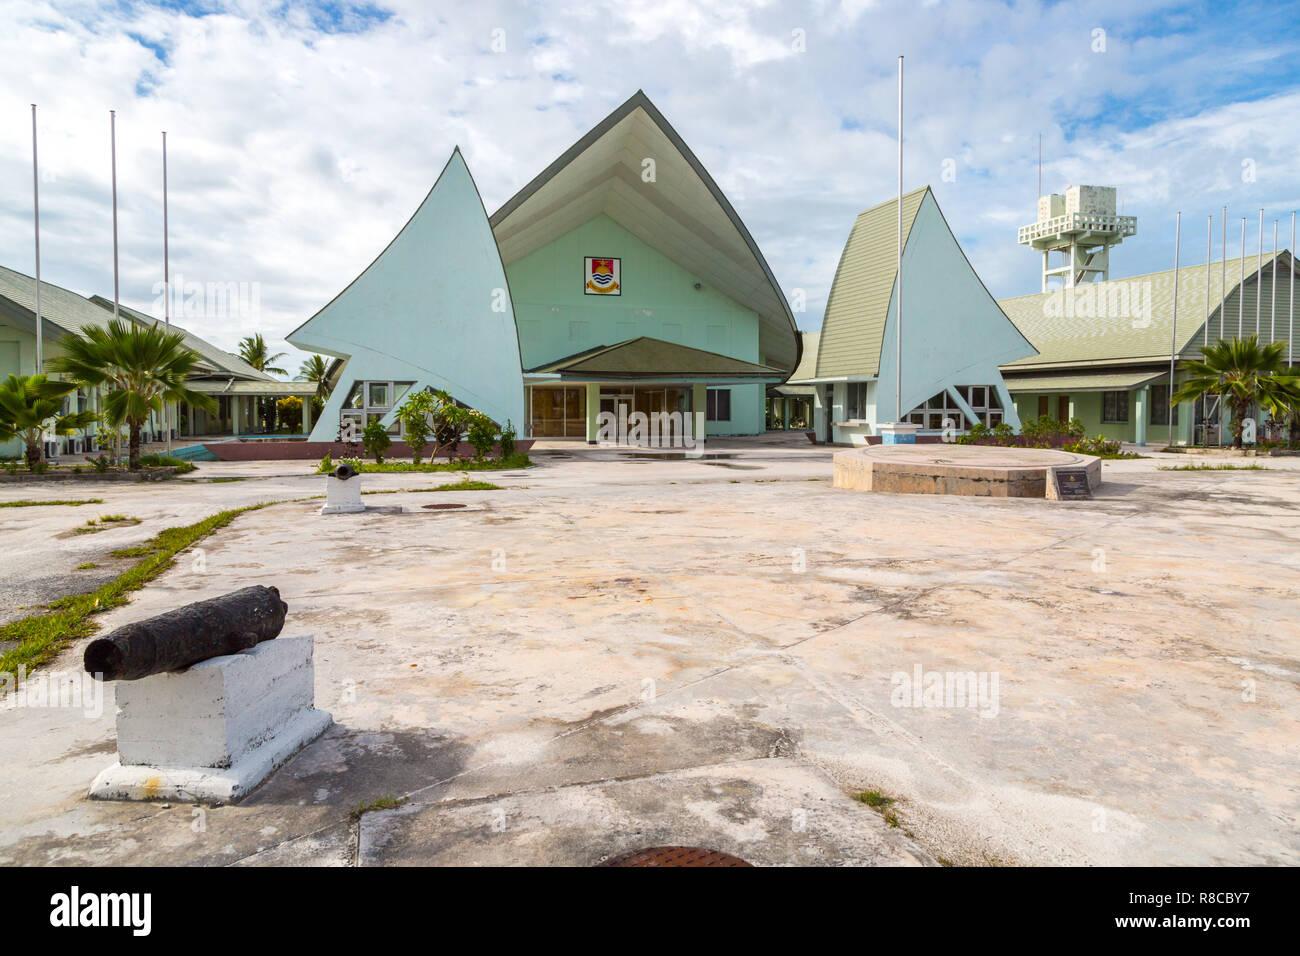 Maneaba ni Maungatabu (Parliament of Kiribati), complex of buildings on a Tarawa atoll lagoon motu. House of Assembly, Ambo, South Tarawa, Kiribati, G - Stock Image